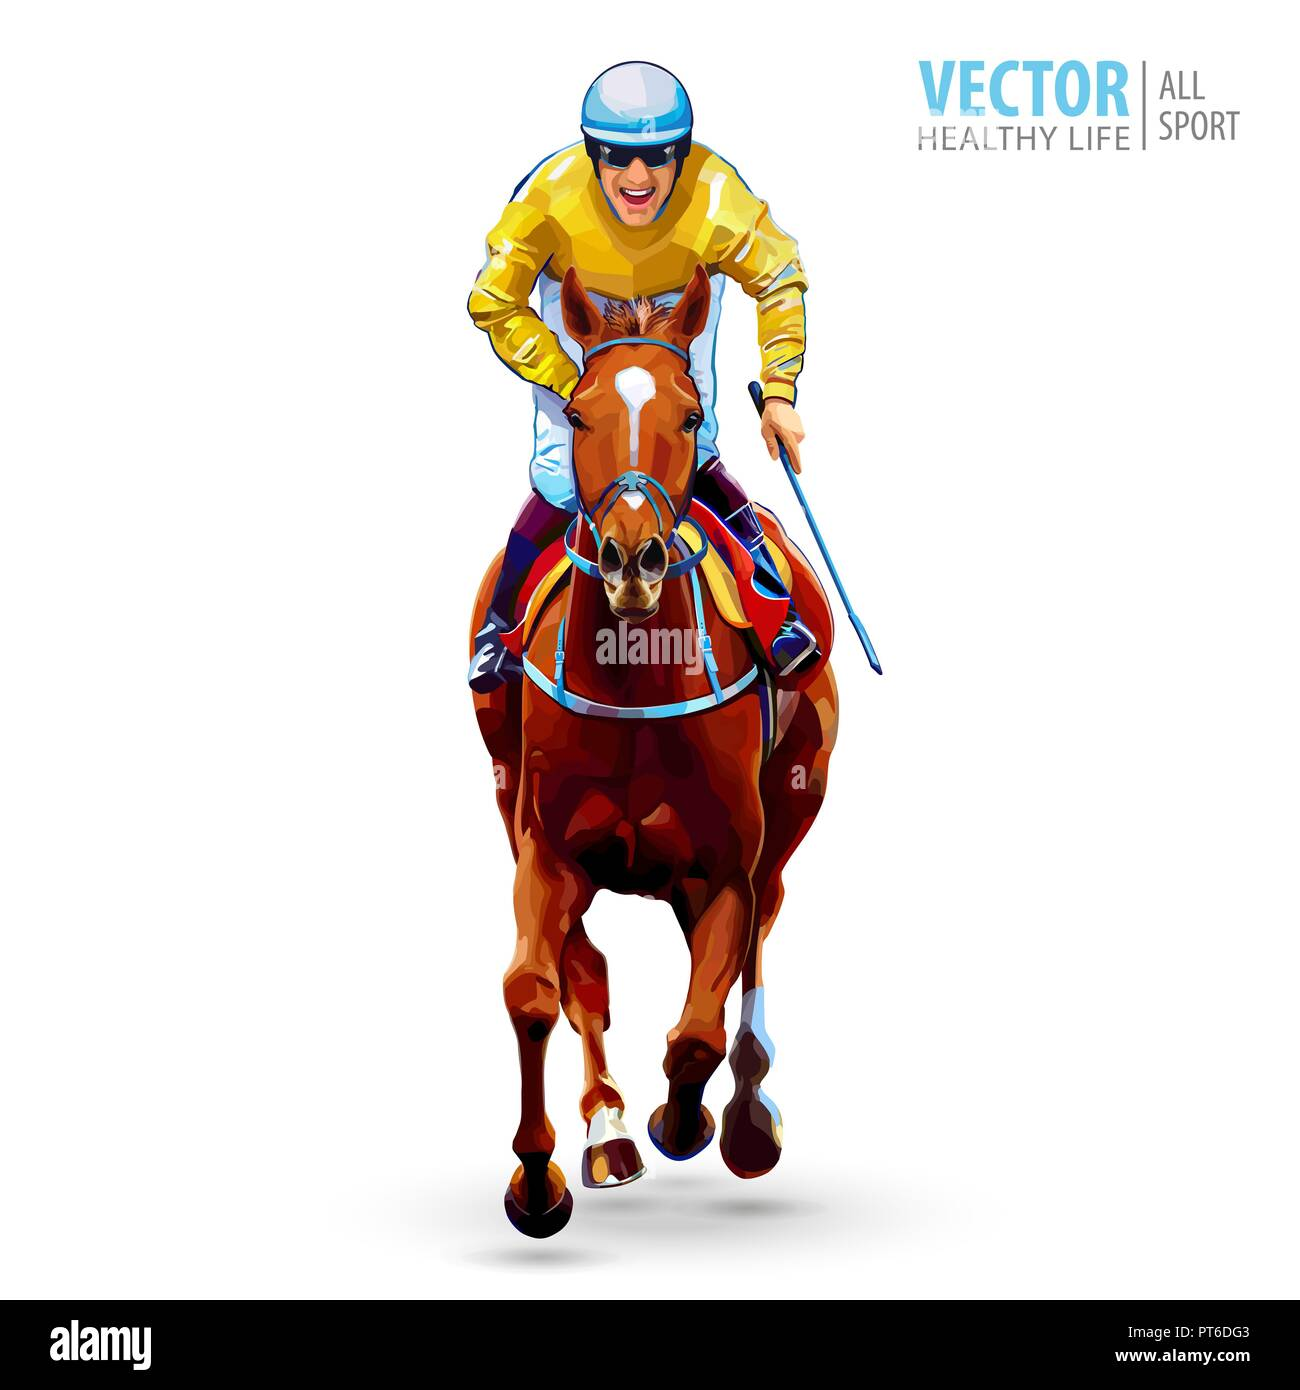 Jockey On Horse Champion Racing Hippodrome Racetrack Jump